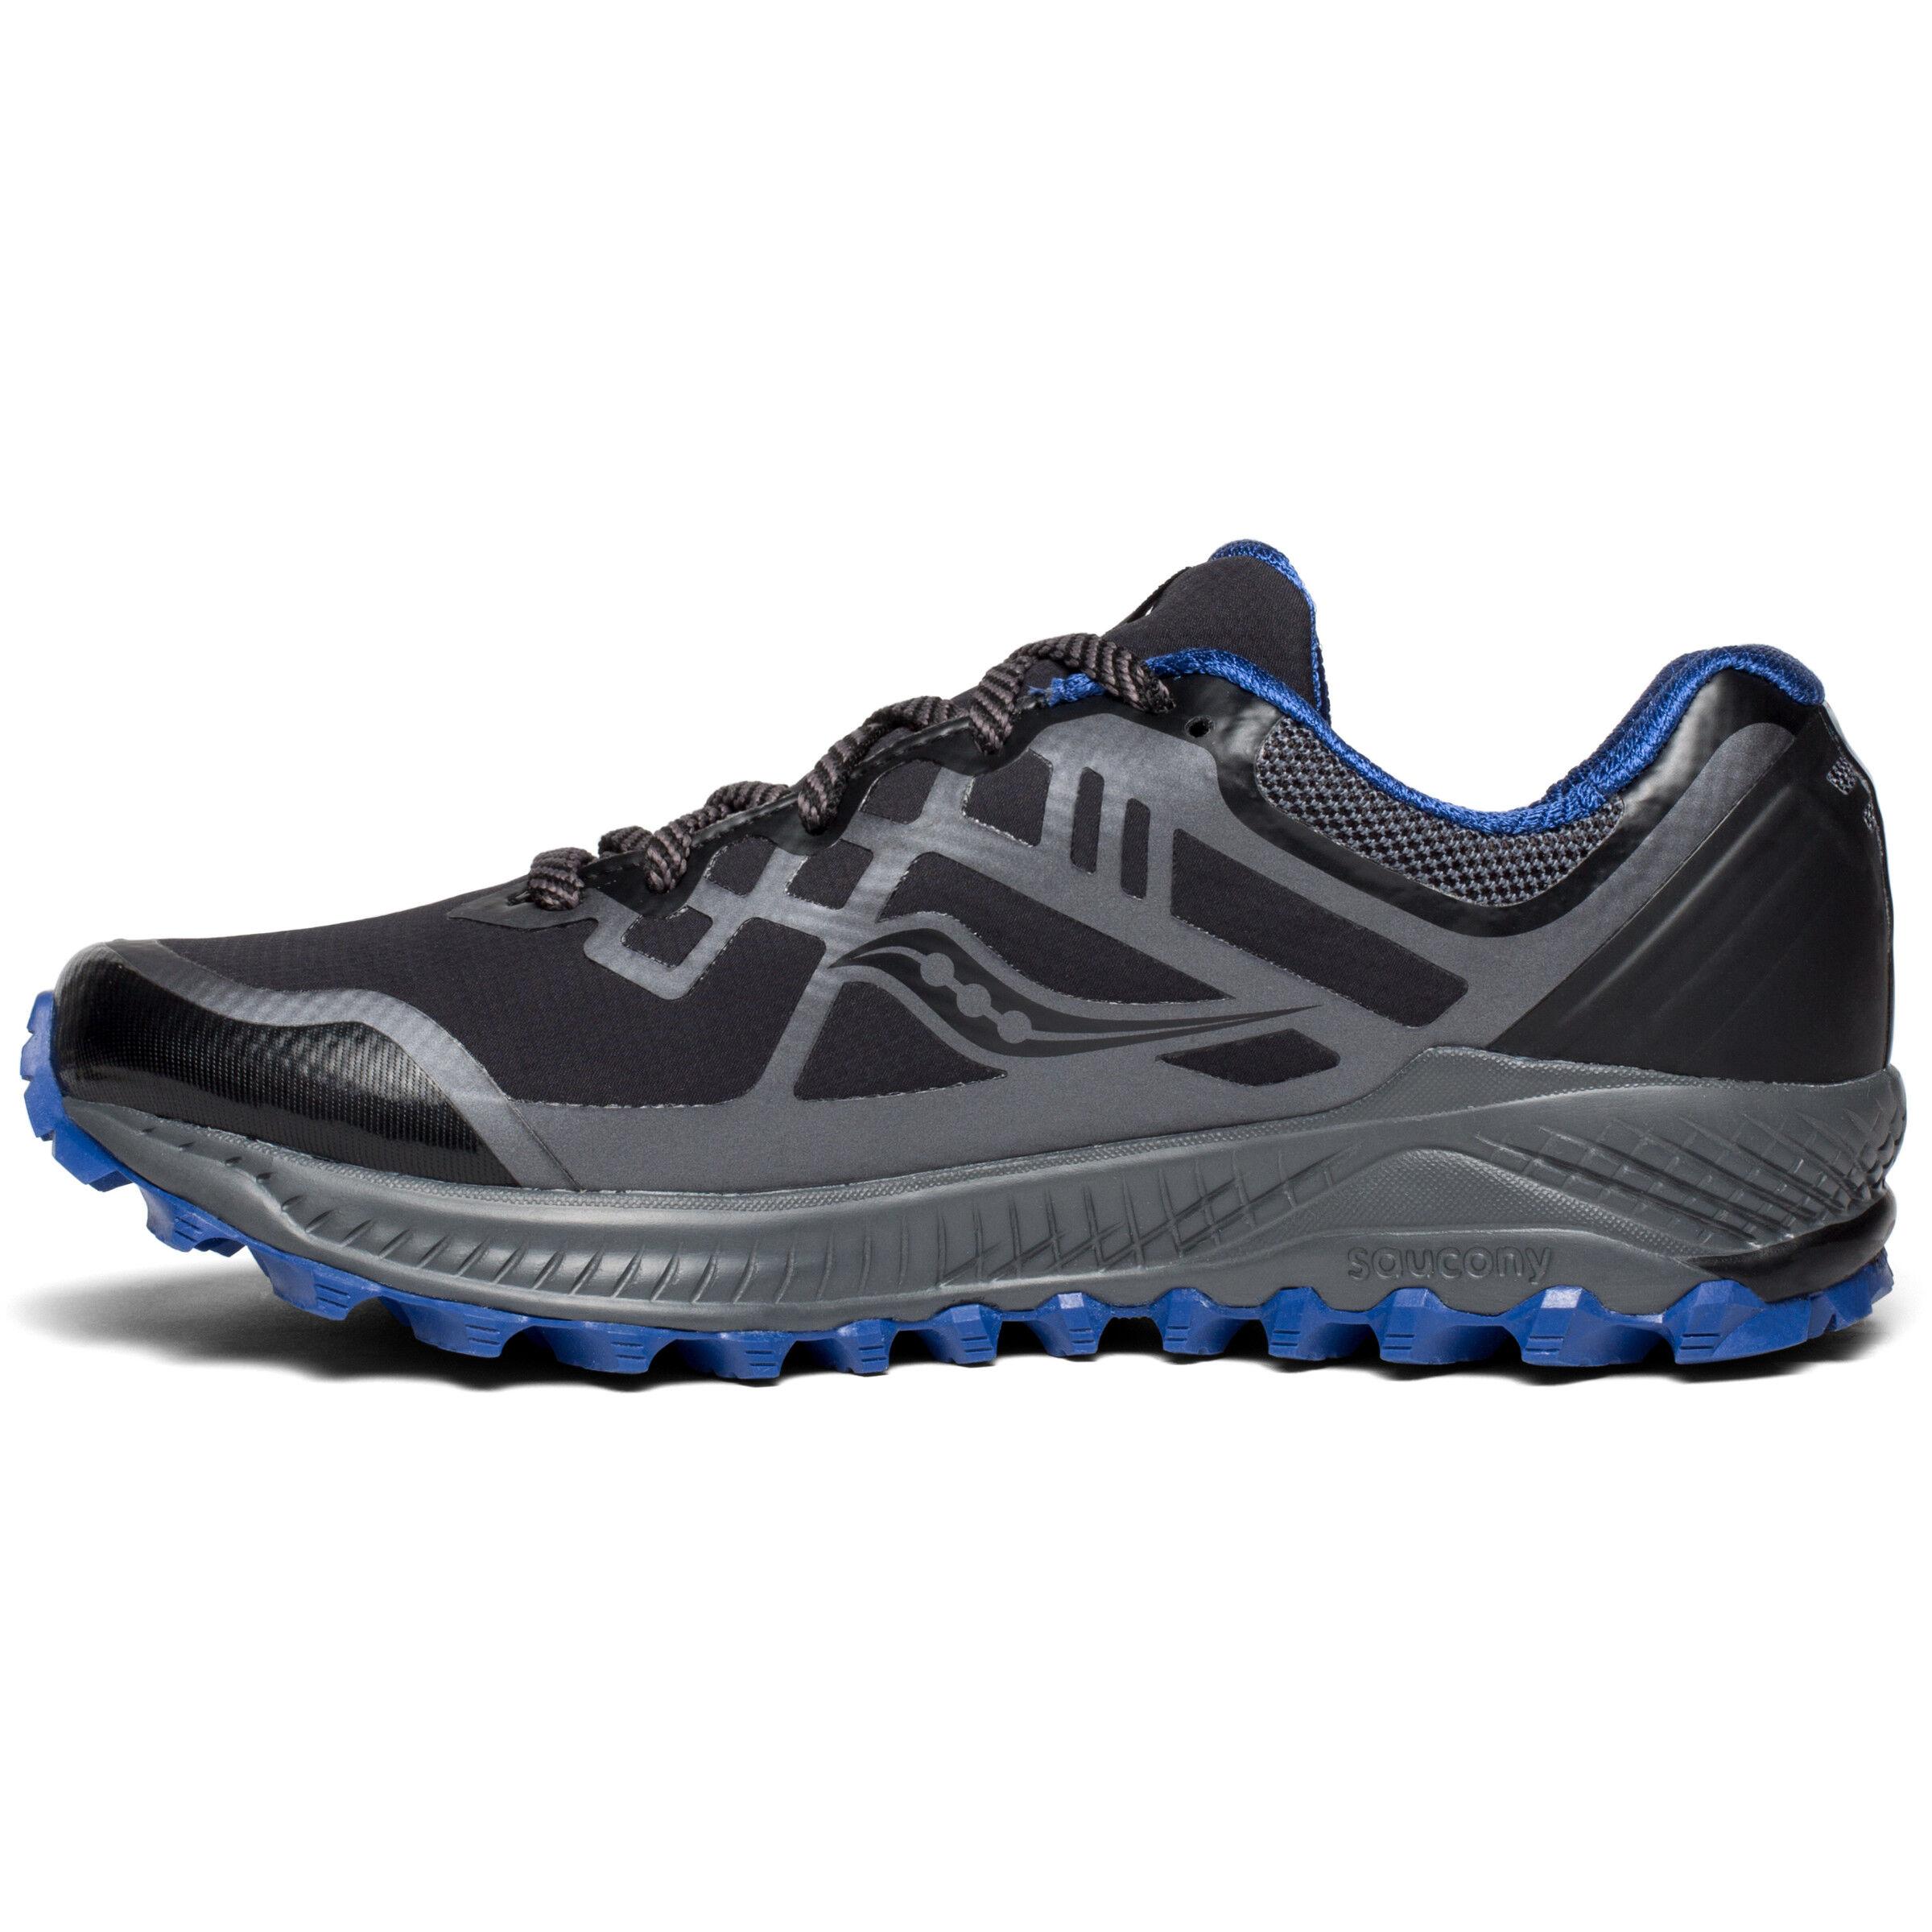 saucony Peregrine 8 GTX Shoes Herren blackgreyblue